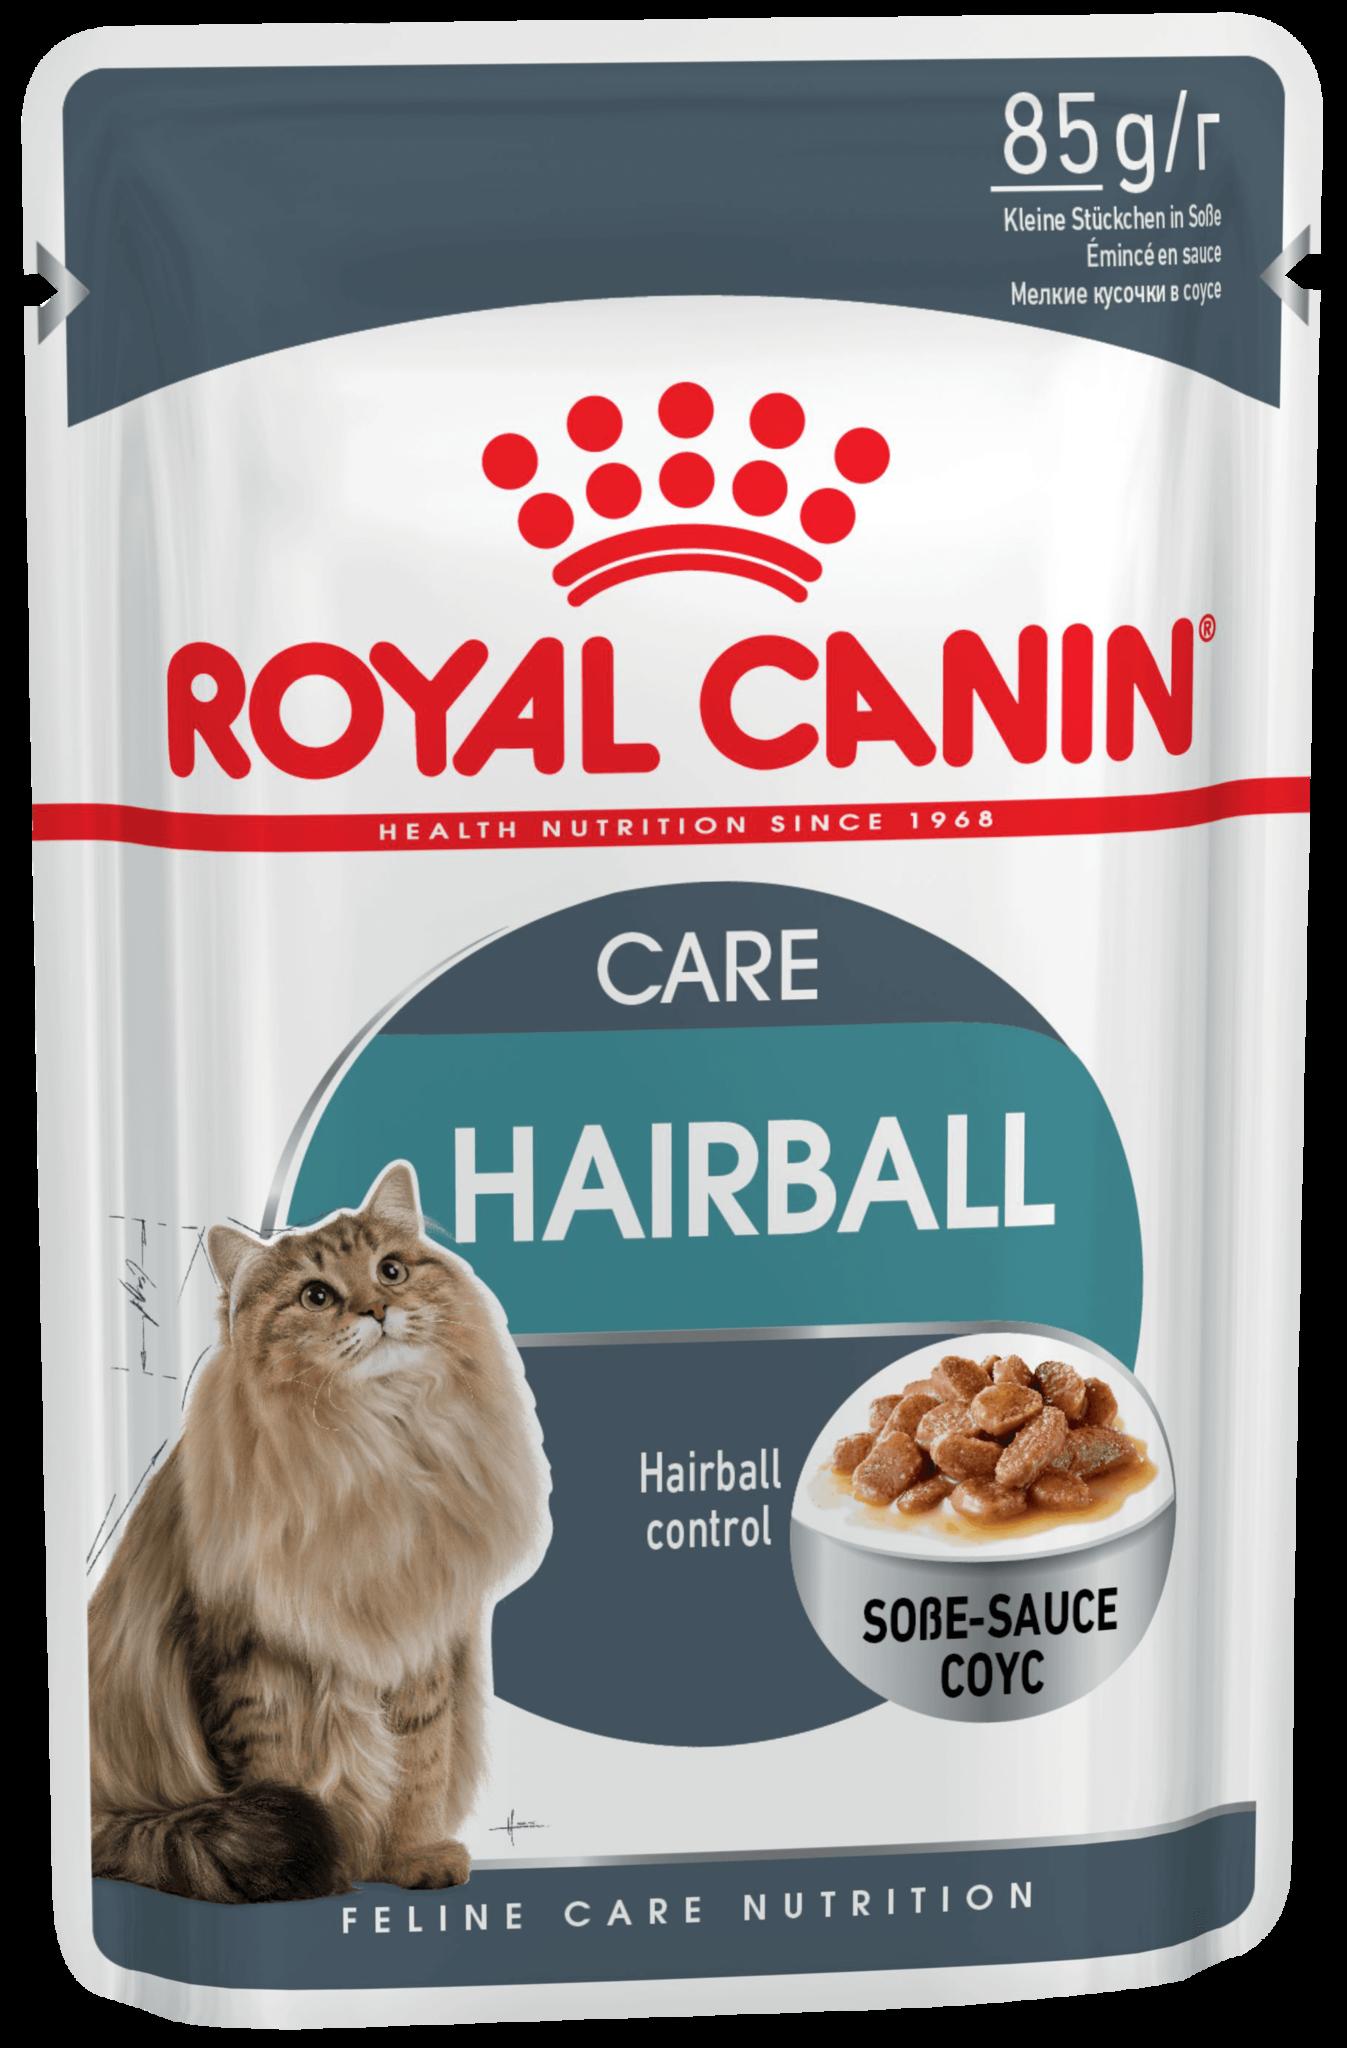 Royal Canin Пауч для кошек, Royal Canin Hairball Care, склонных к развитию мочекаменной болезни, (в соусе) f_hairball-care-in-gravy.png